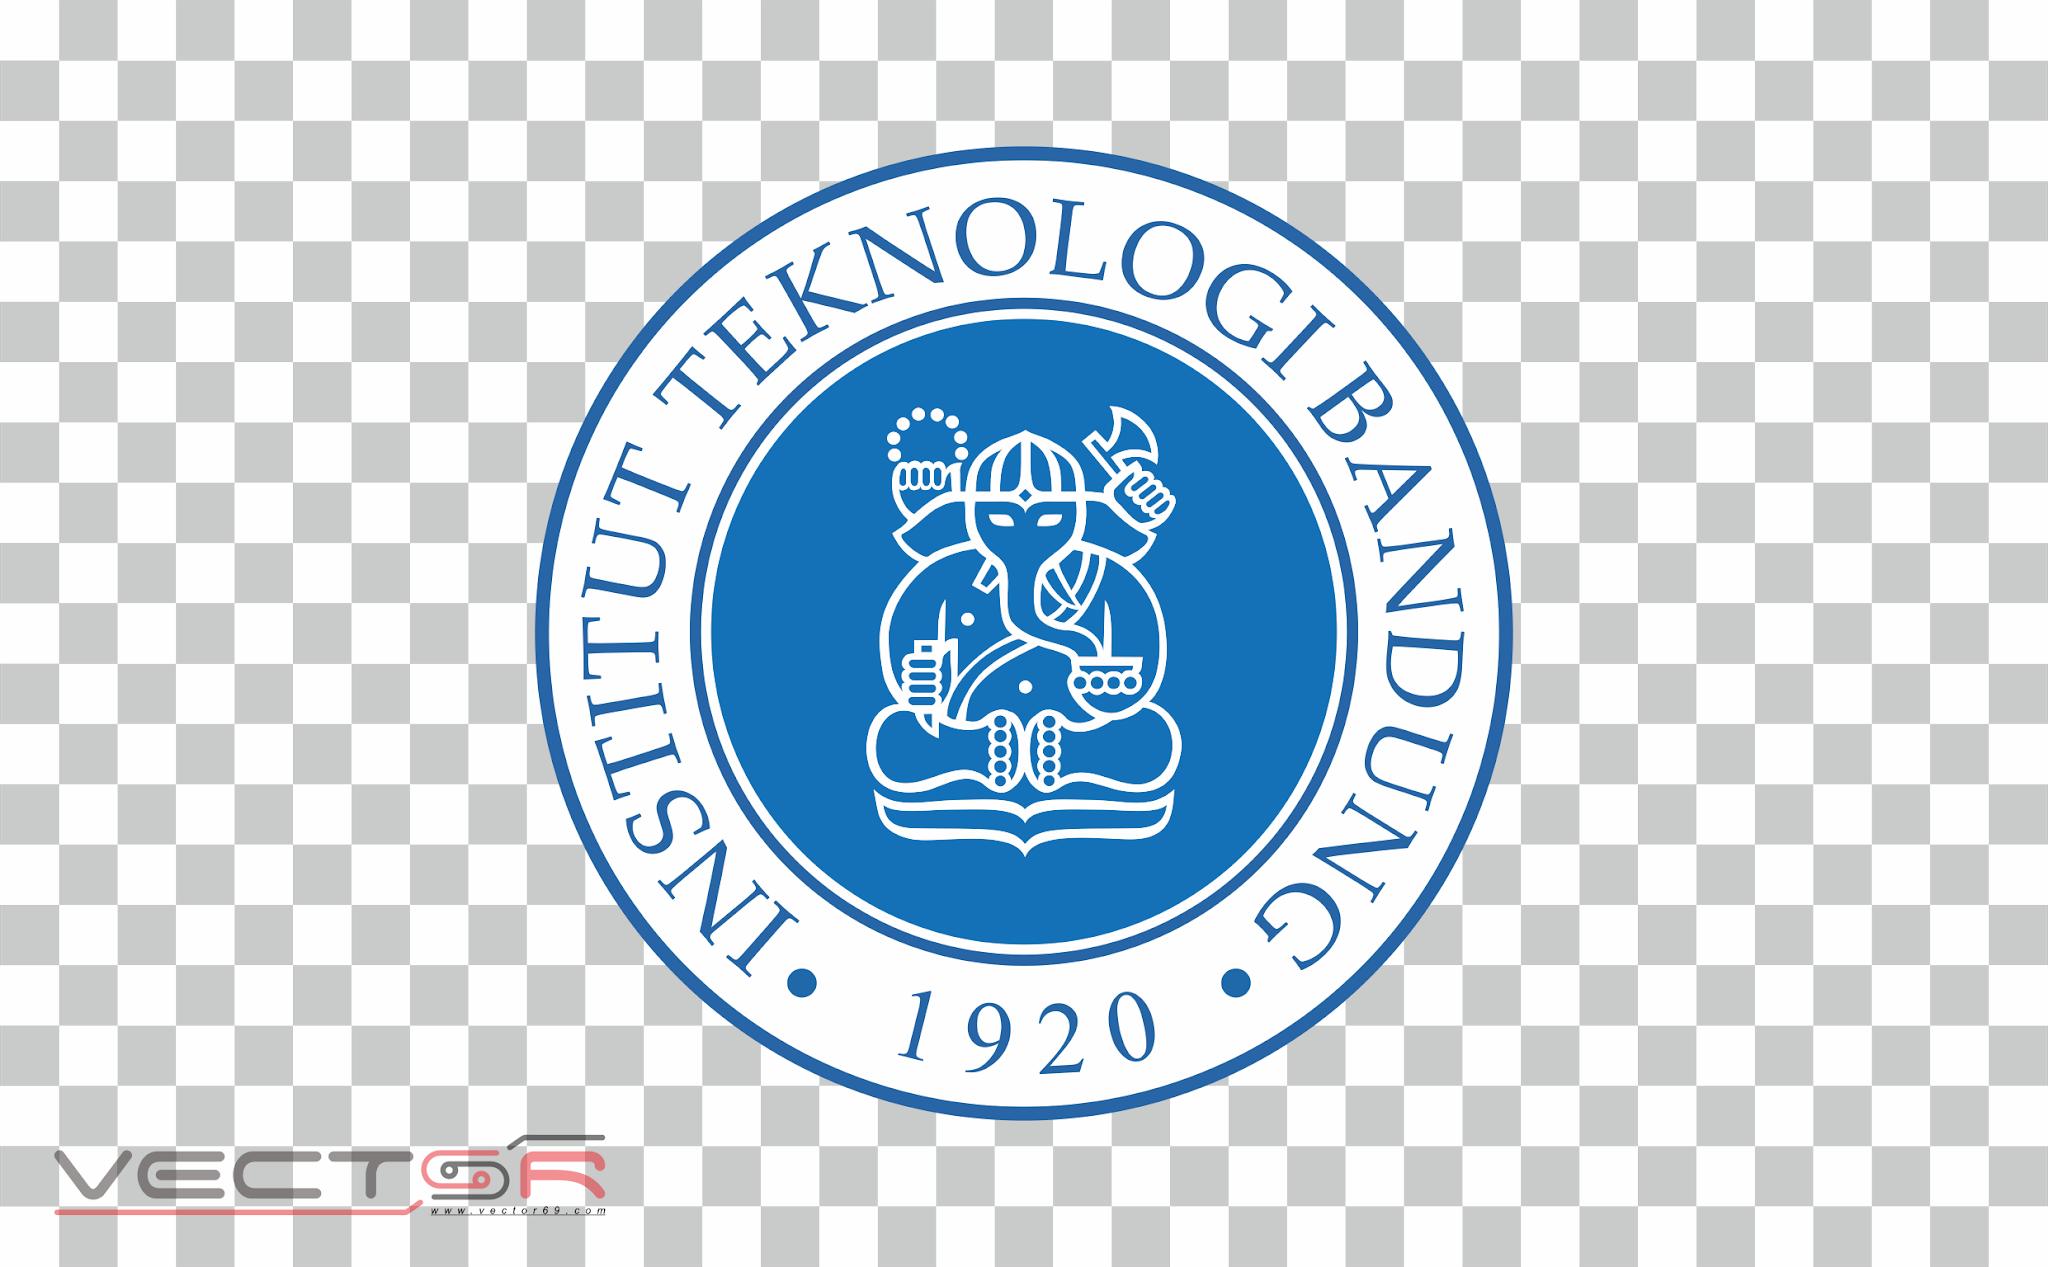 Logo ITB (Institut Teknologi Bandung) - Download .PNG (Portable Network Graphics) Transparent Images